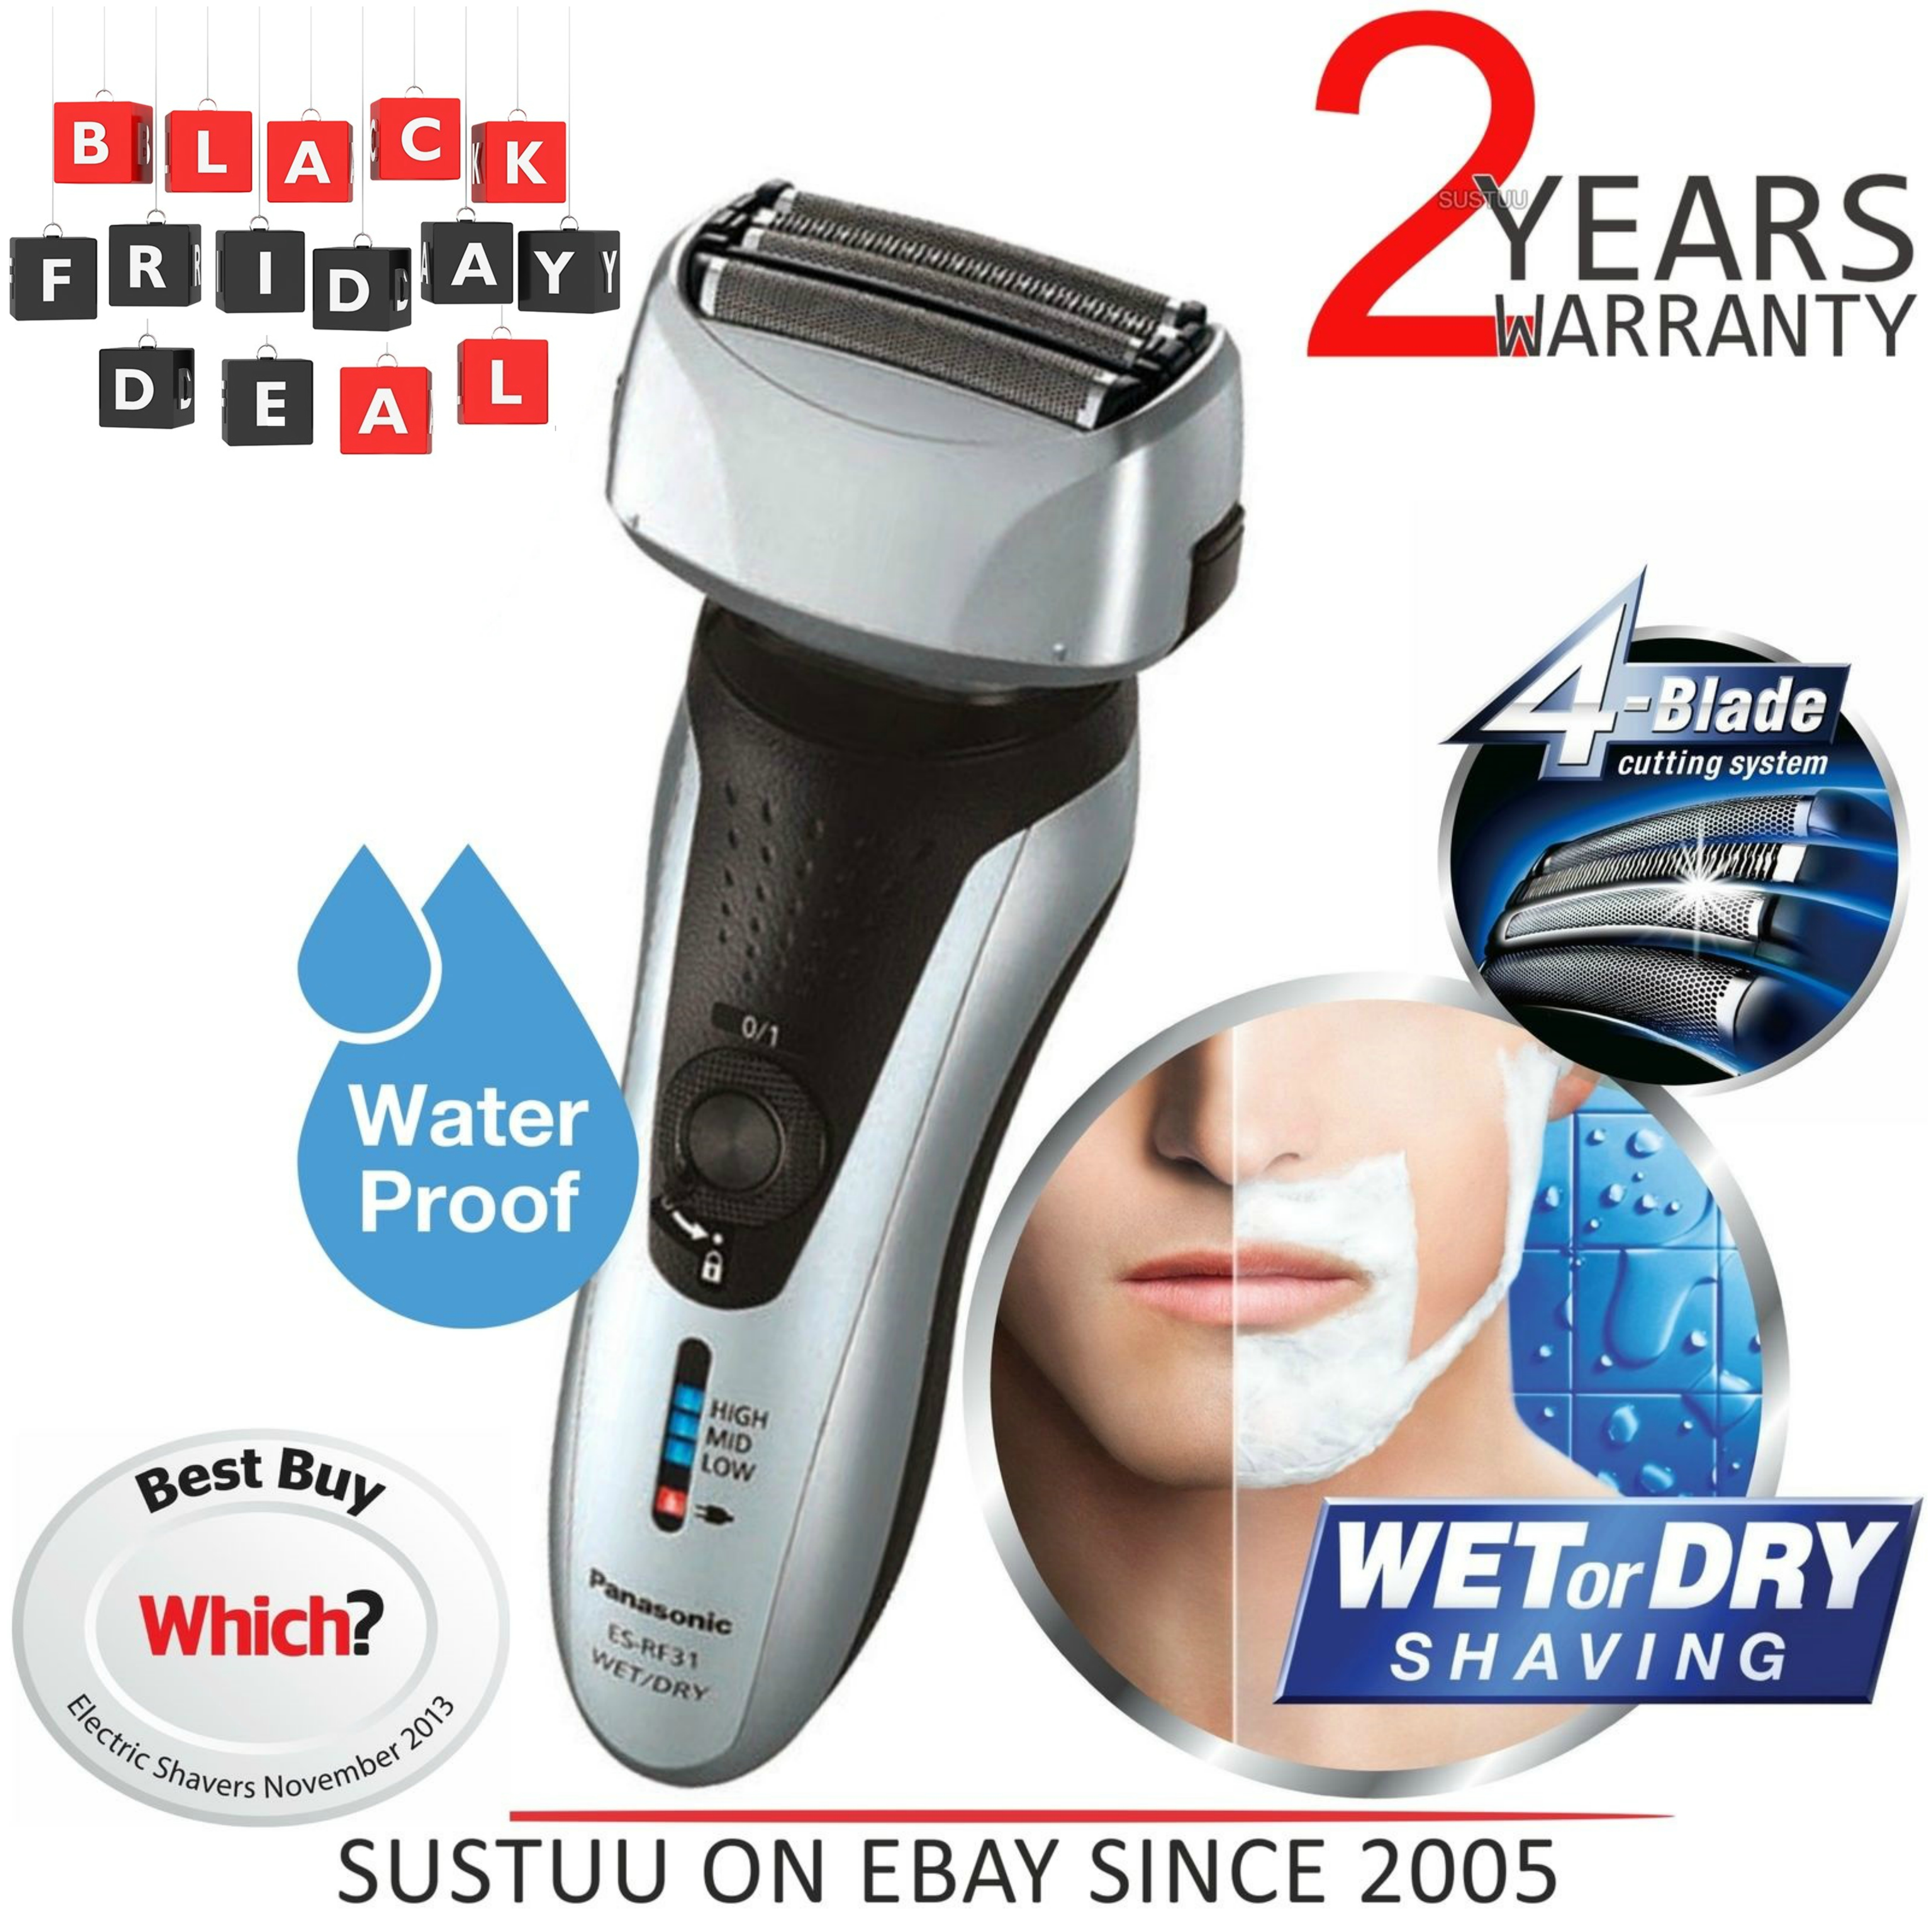 Panasonic ESRF31S 4 Blade Wet/Dry Men's Shaver Trimmer?Rechargeable?Washable?NEW